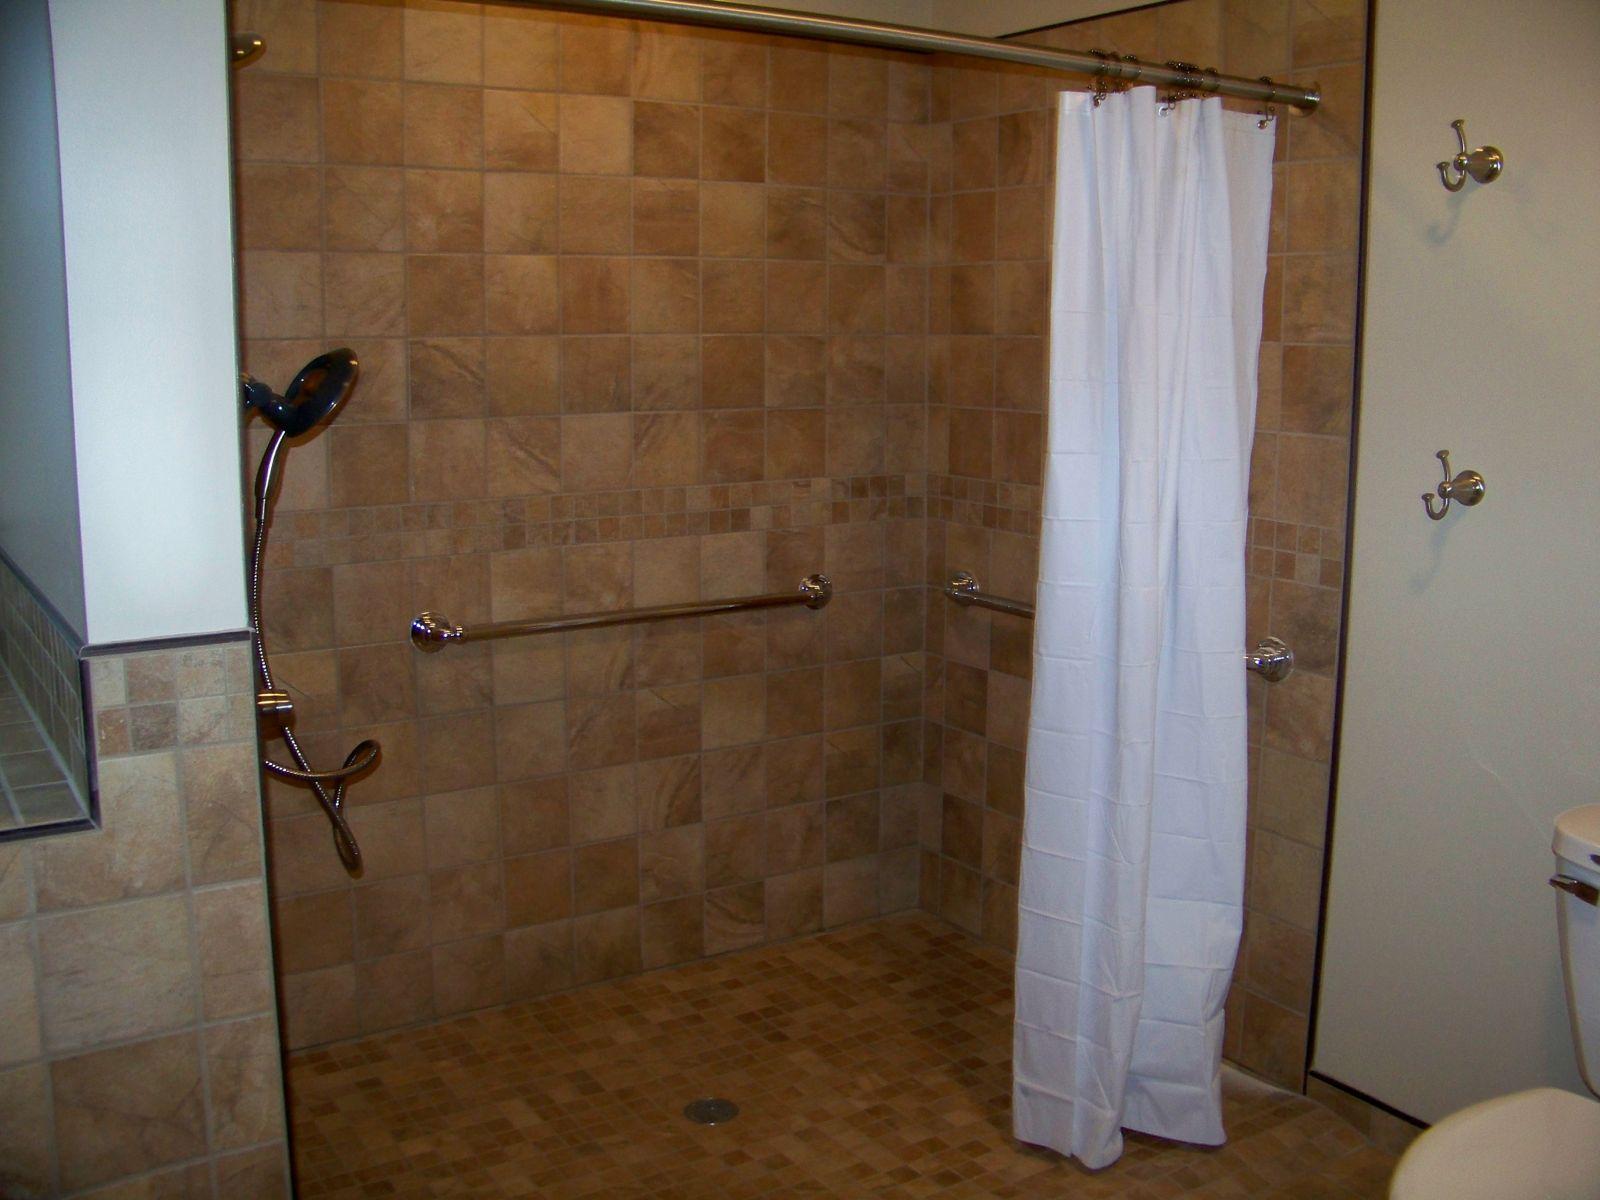 Prefab Shower Caulk Door Jamb To Ensure Watertight Fit